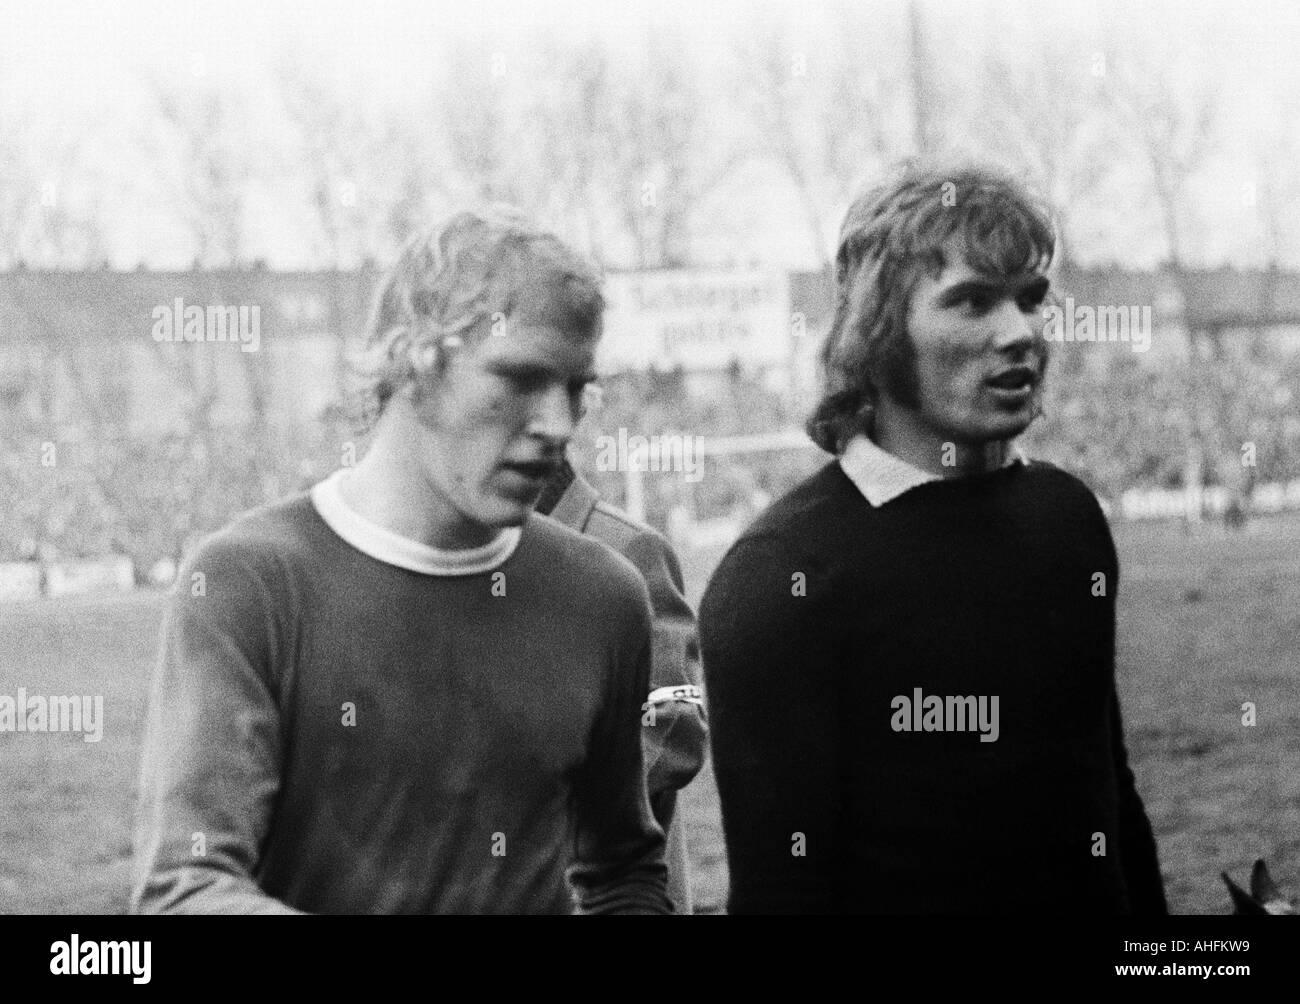 football, Bundesliga, 1971/1972, FC Schalke 04 versus Hamburger SV 3:0, Glueckaufkampfbahn Stadium in Gelsenkirchen, football players leave the pitch, left Rolf Ruessmann (S04), right keeper Norbert Nigbur (S04) - Stock Image